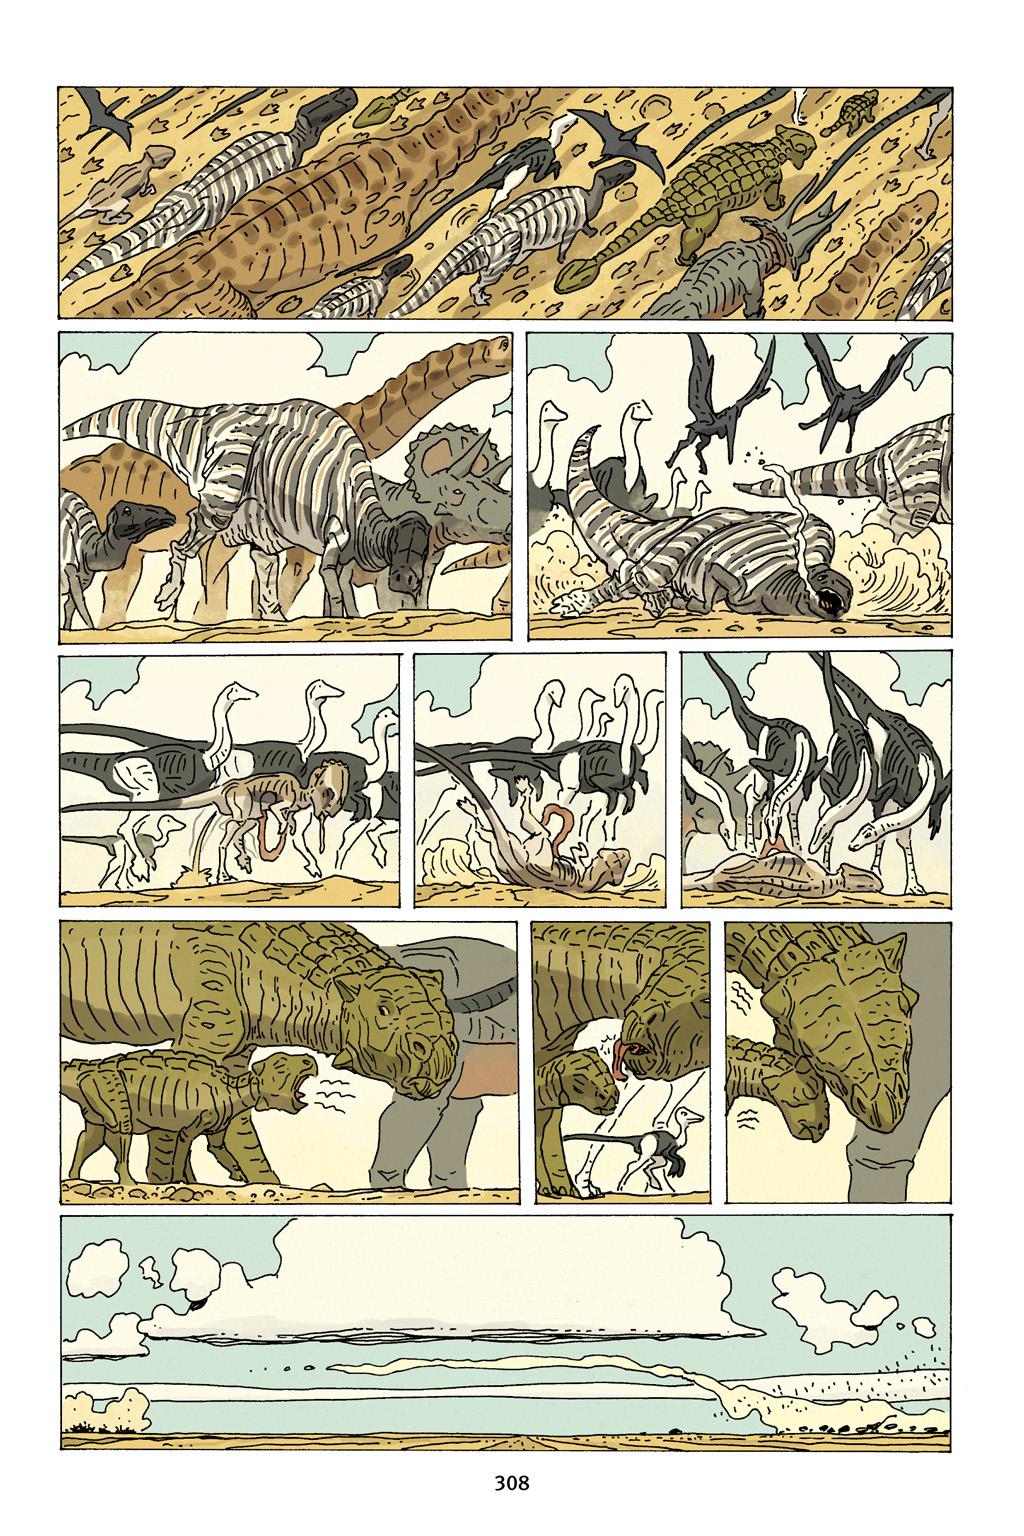 Age of Reptiles Omnibus Chap 11 - Next Chap 12